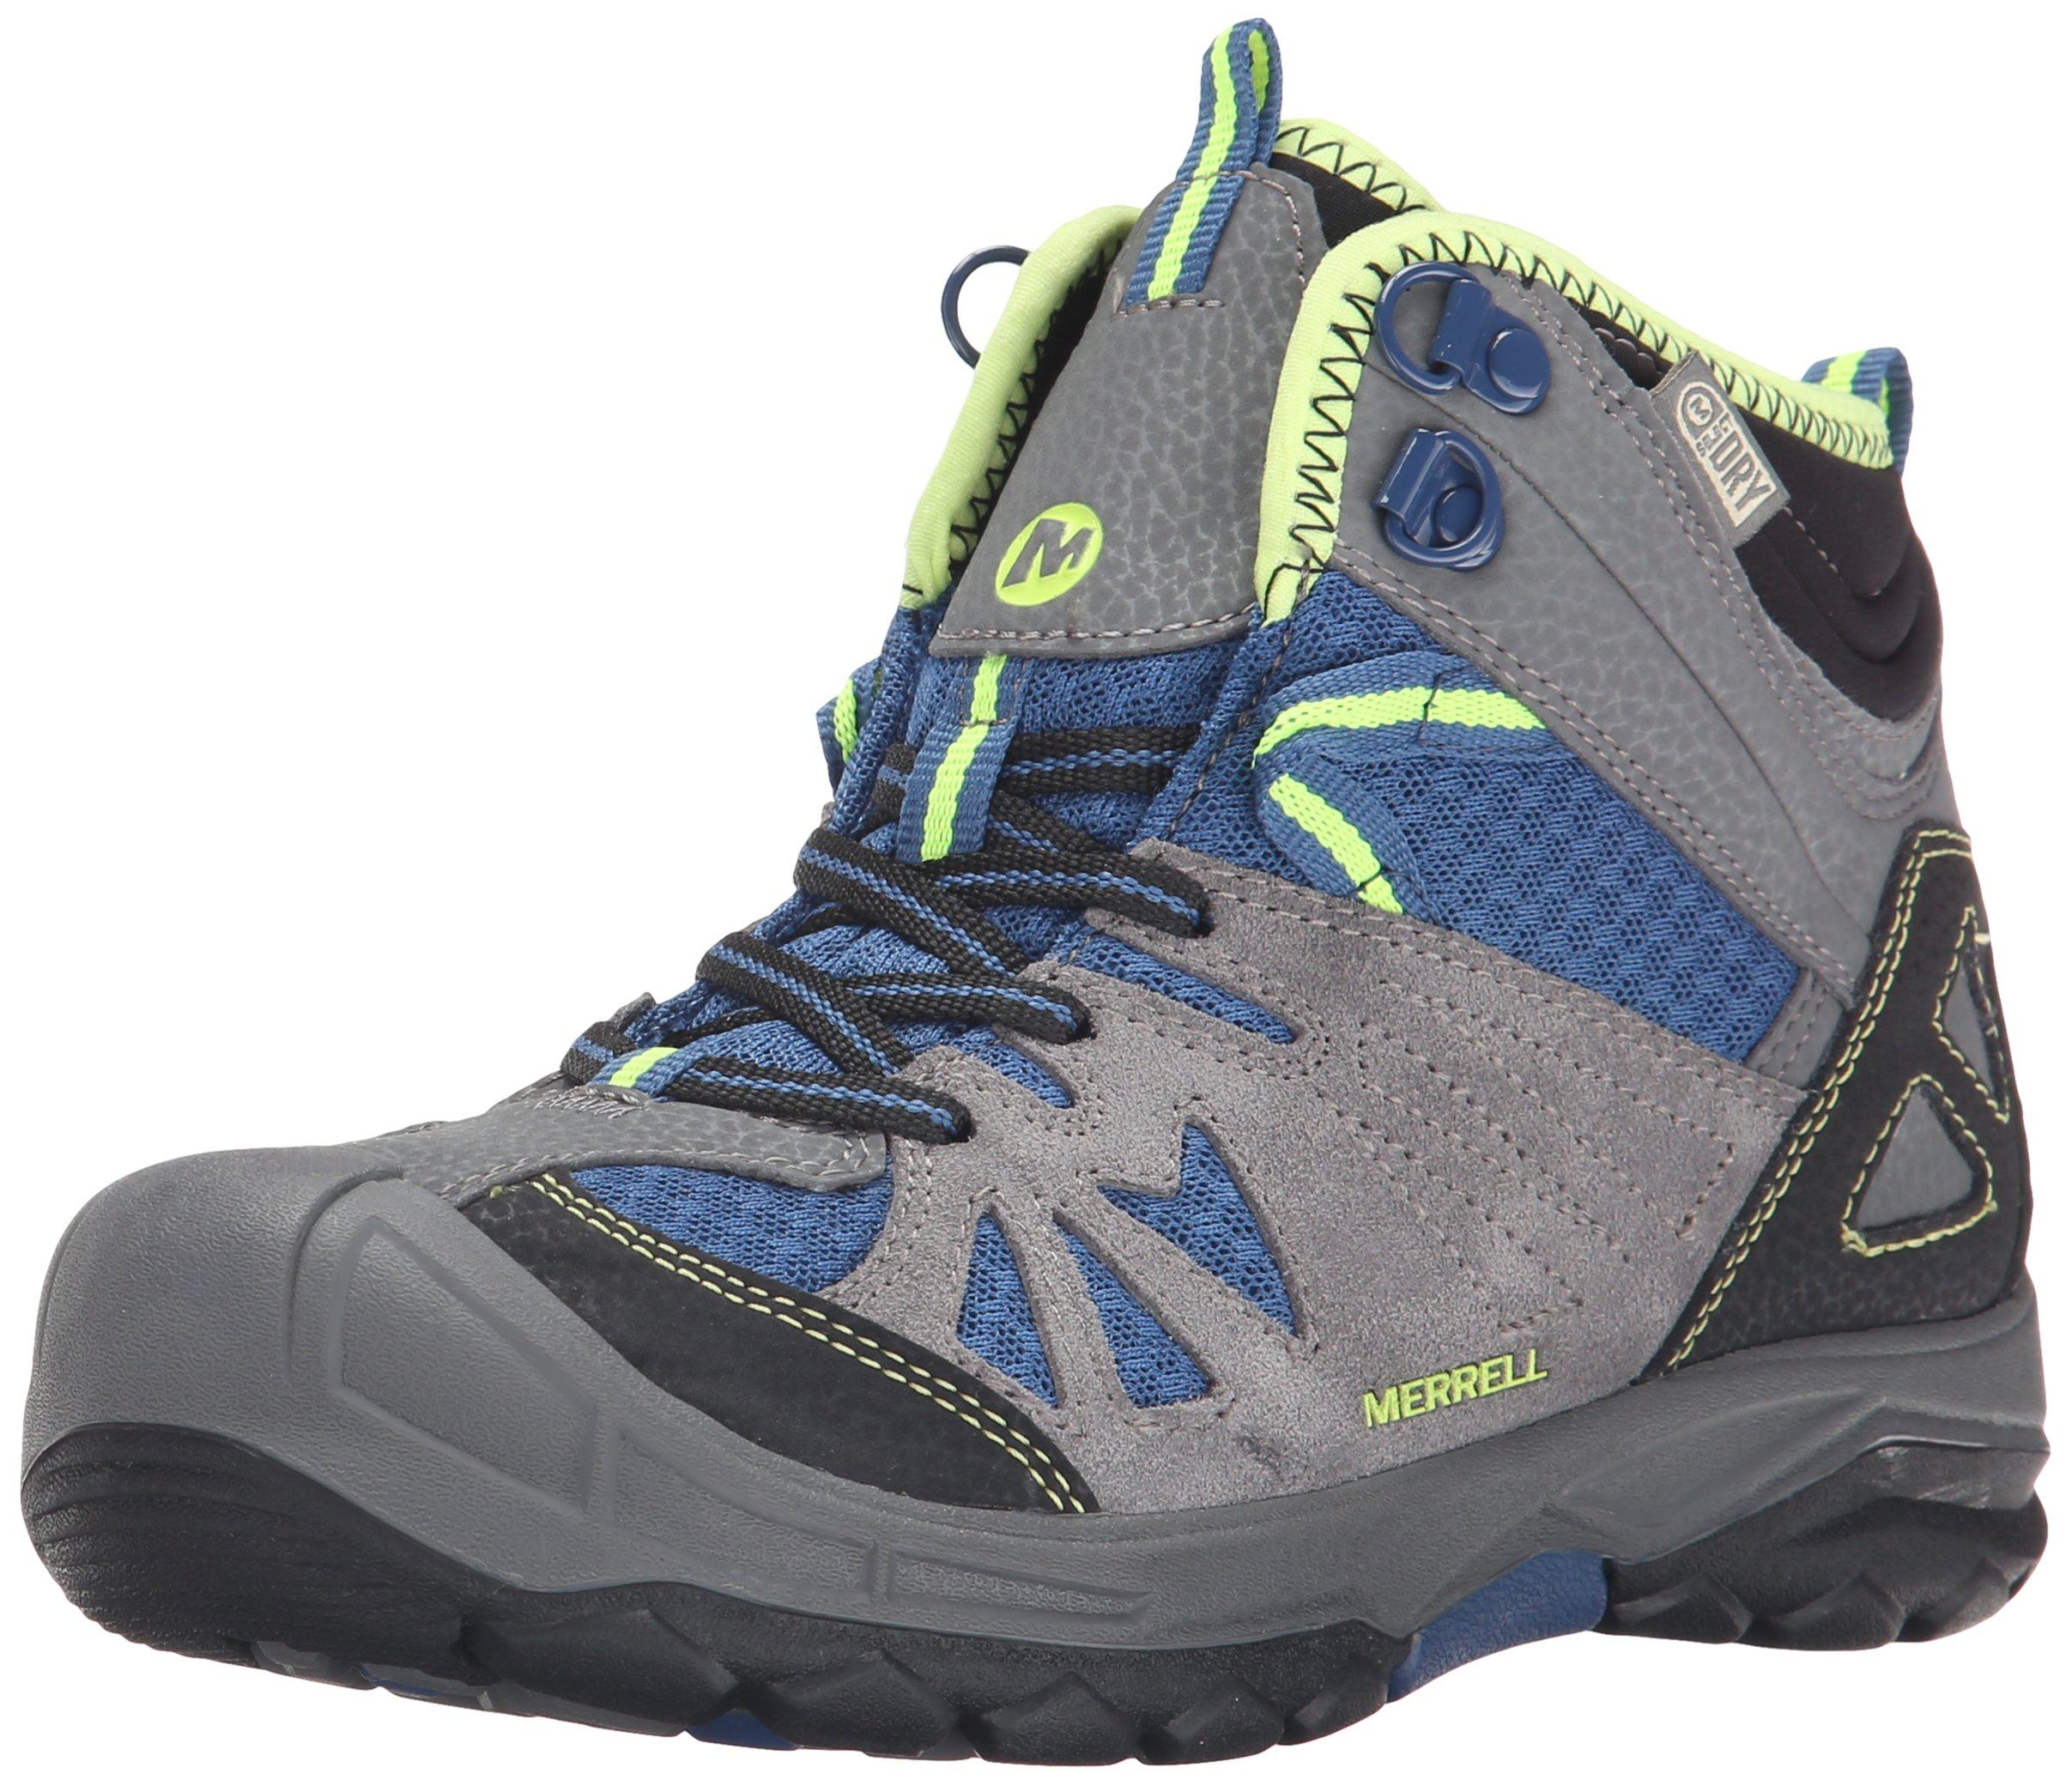 Merrell Capra Mid Waterproof Hiking Boot (Toddler/Little Kid/Big Kid), Grey/Blue, 7 M US Big Kid by Merrell